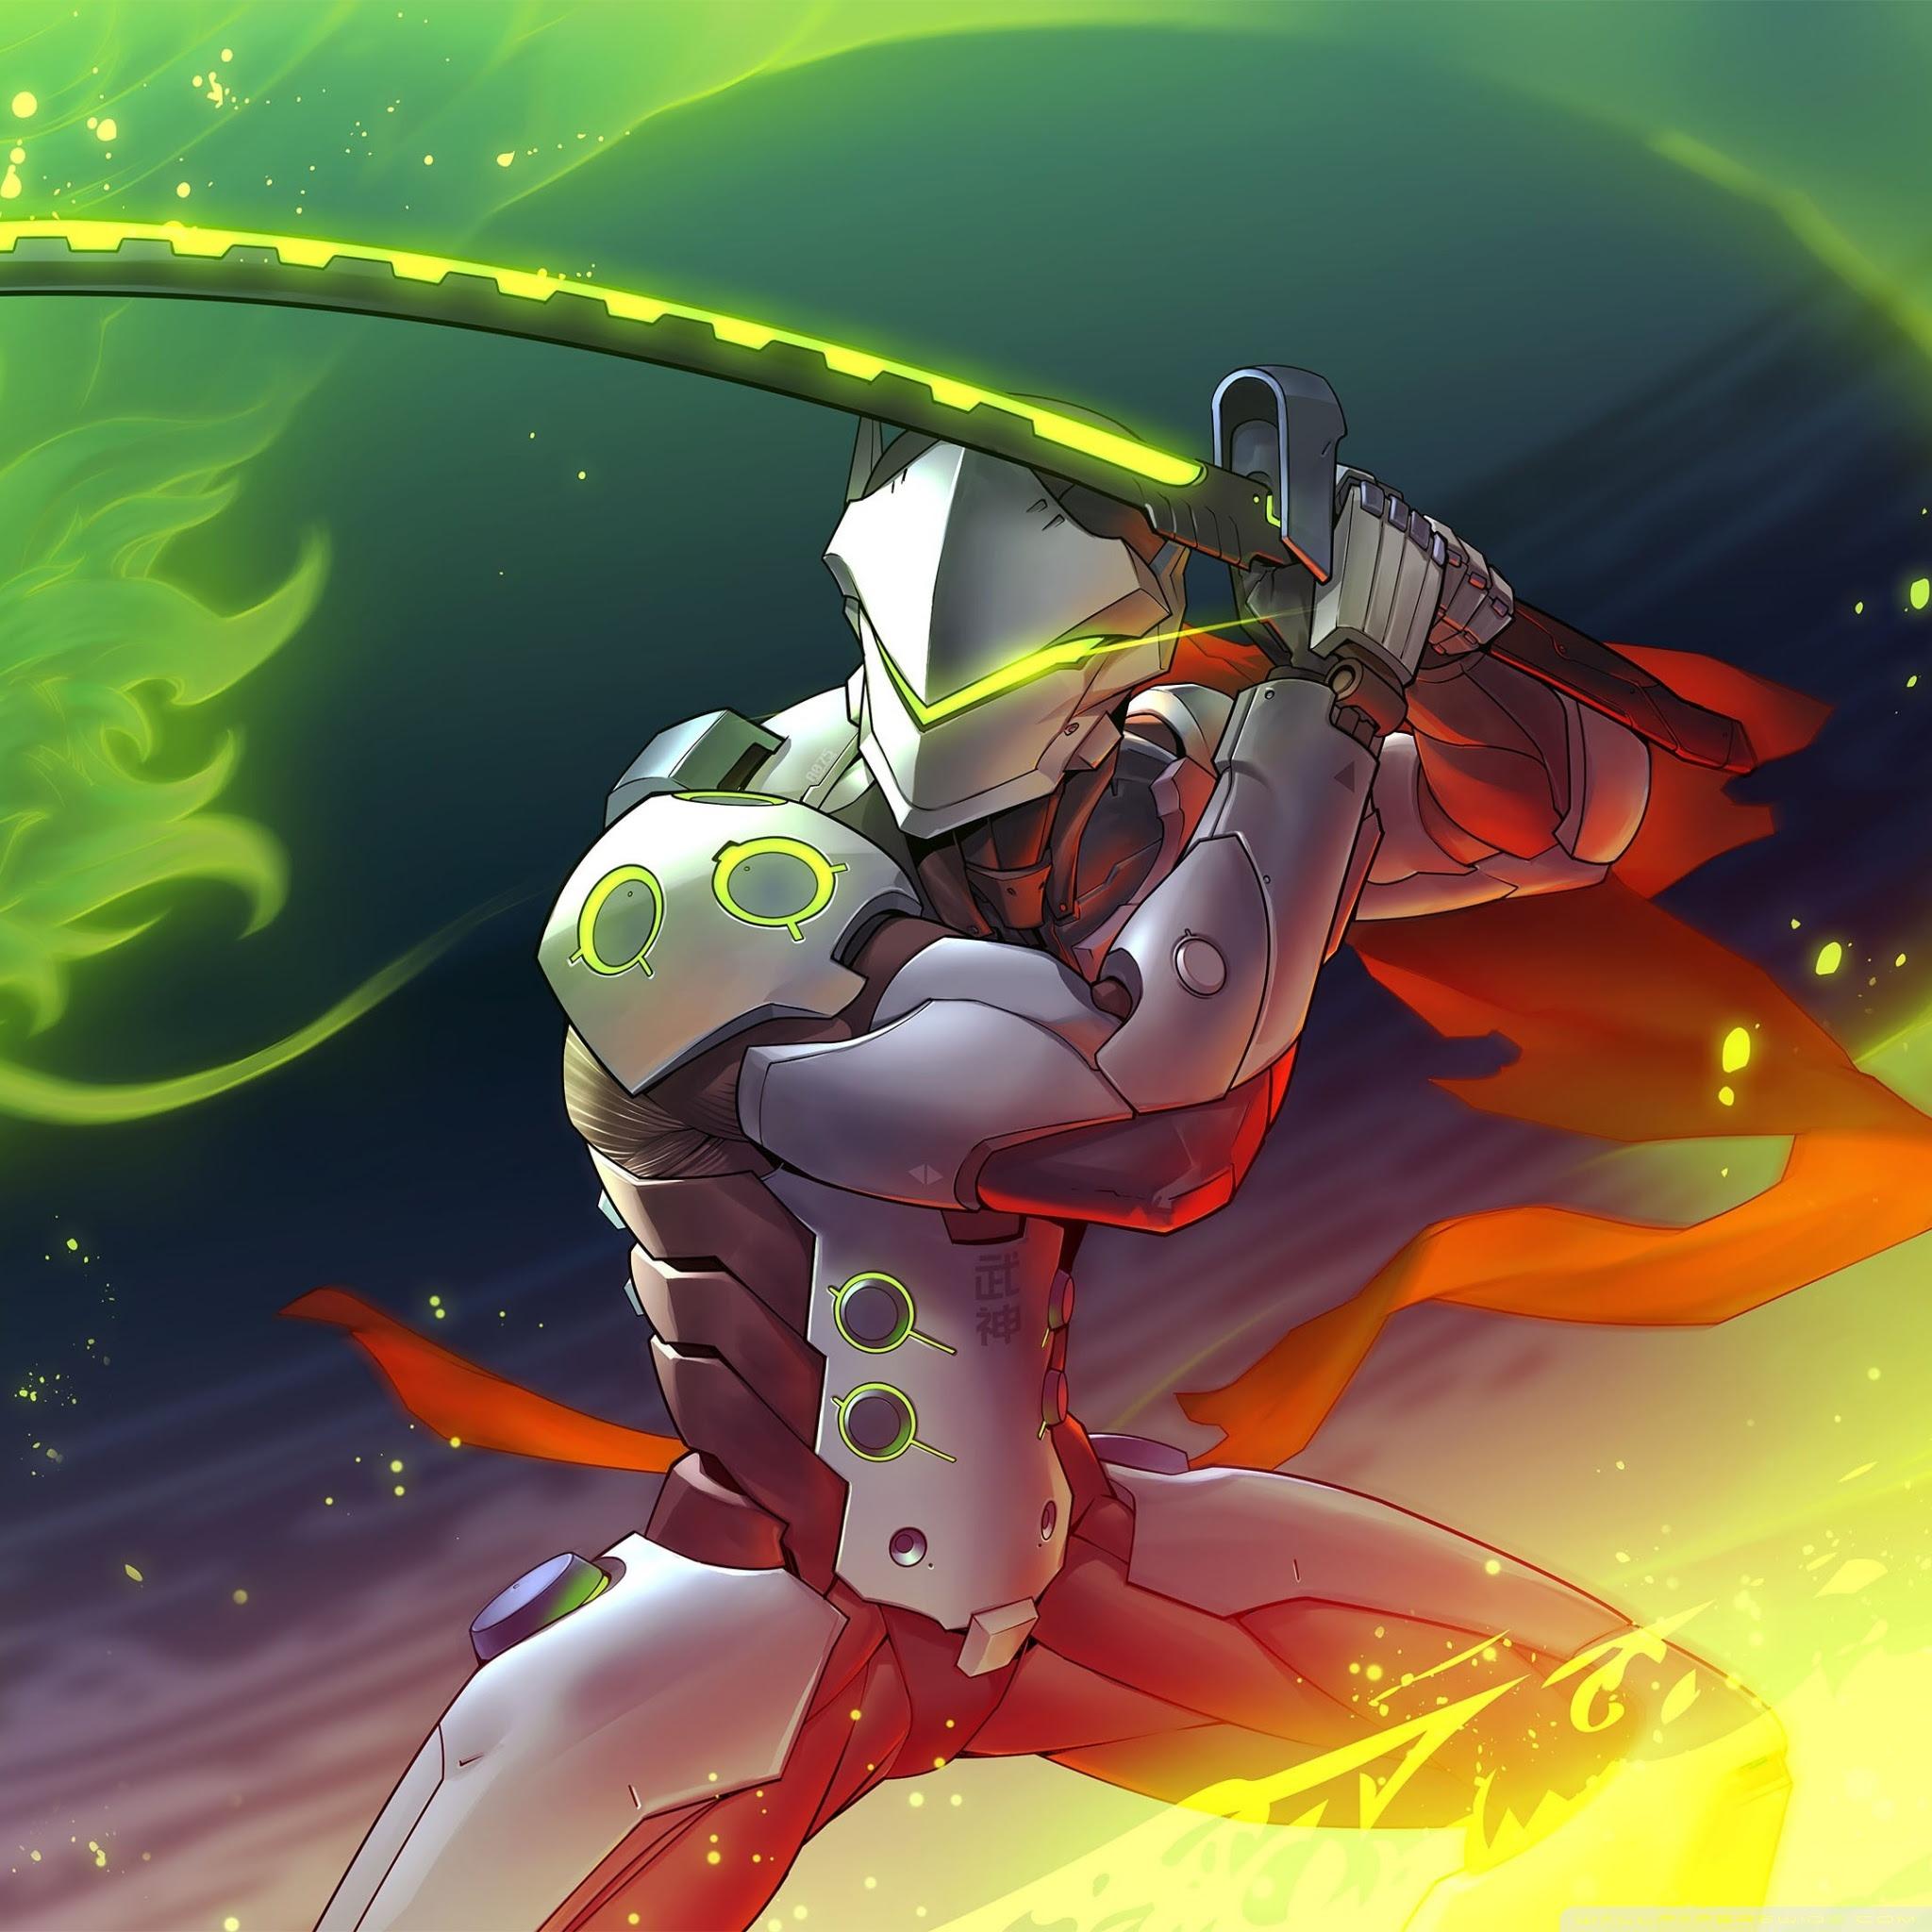 Beautiful Genji Overwatch 2 Wallpaper Hd Photos